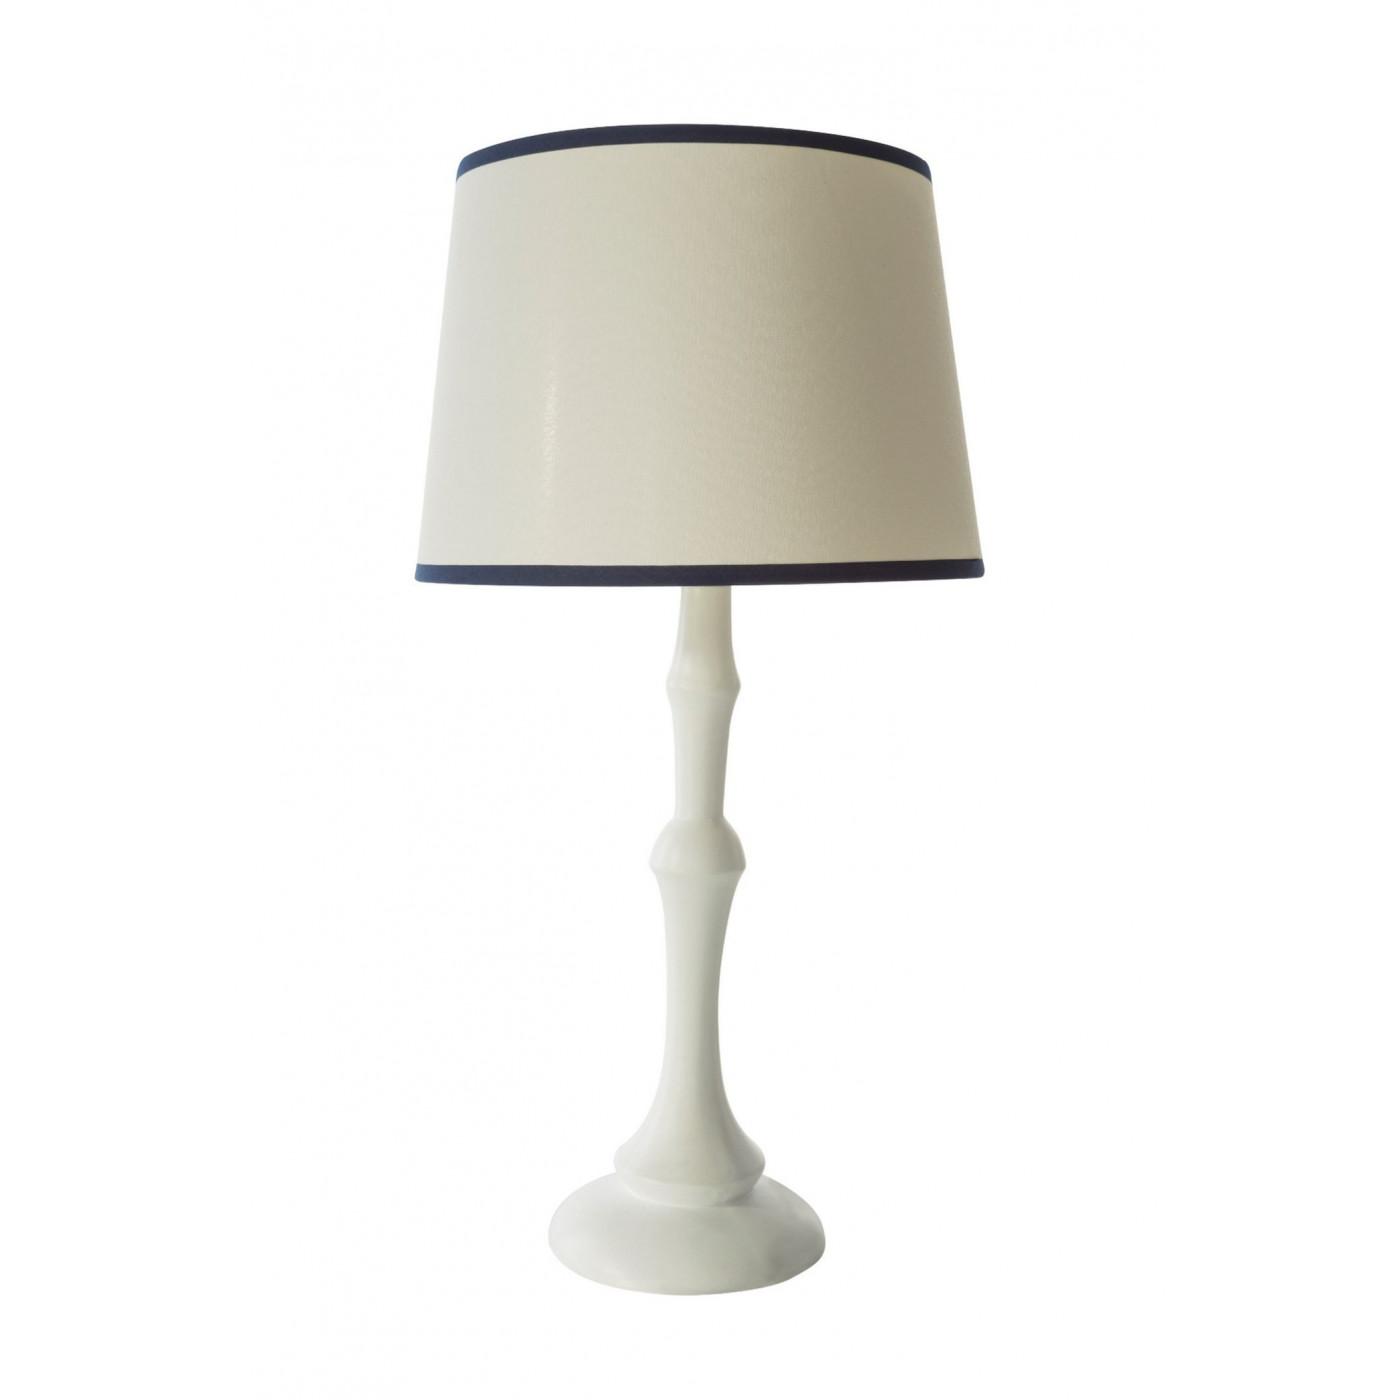 Lampa dekoracyjna ecru 55 cm